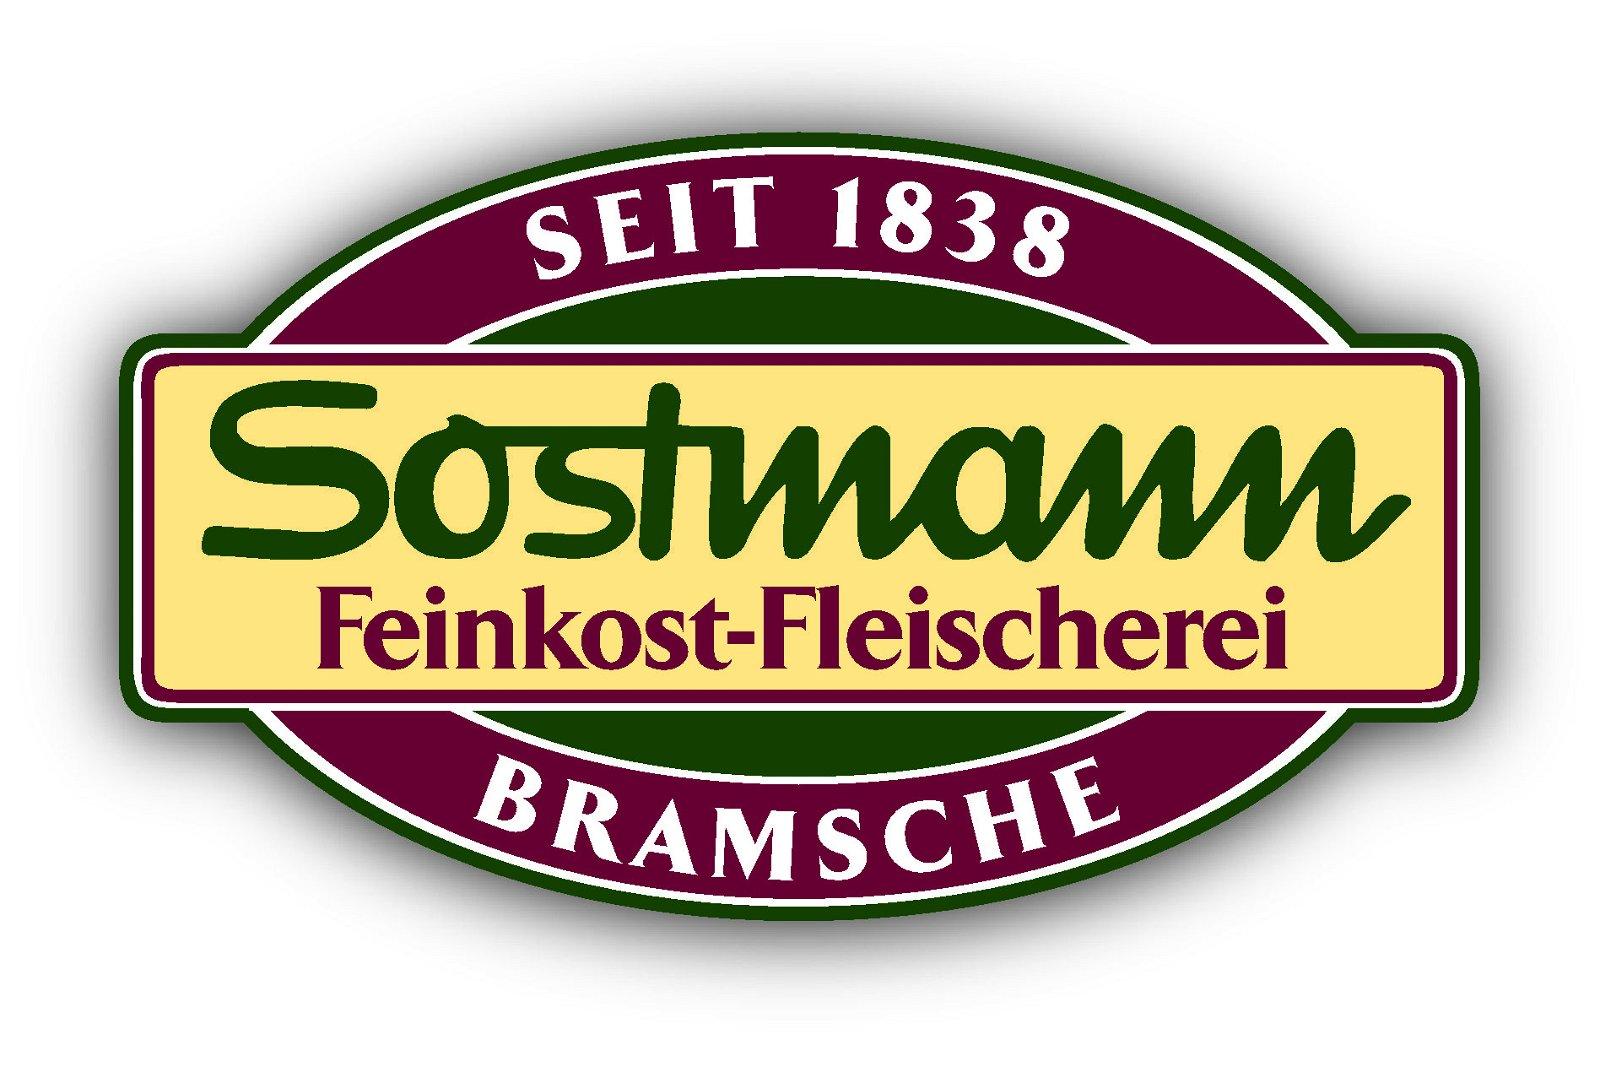 Sostmann